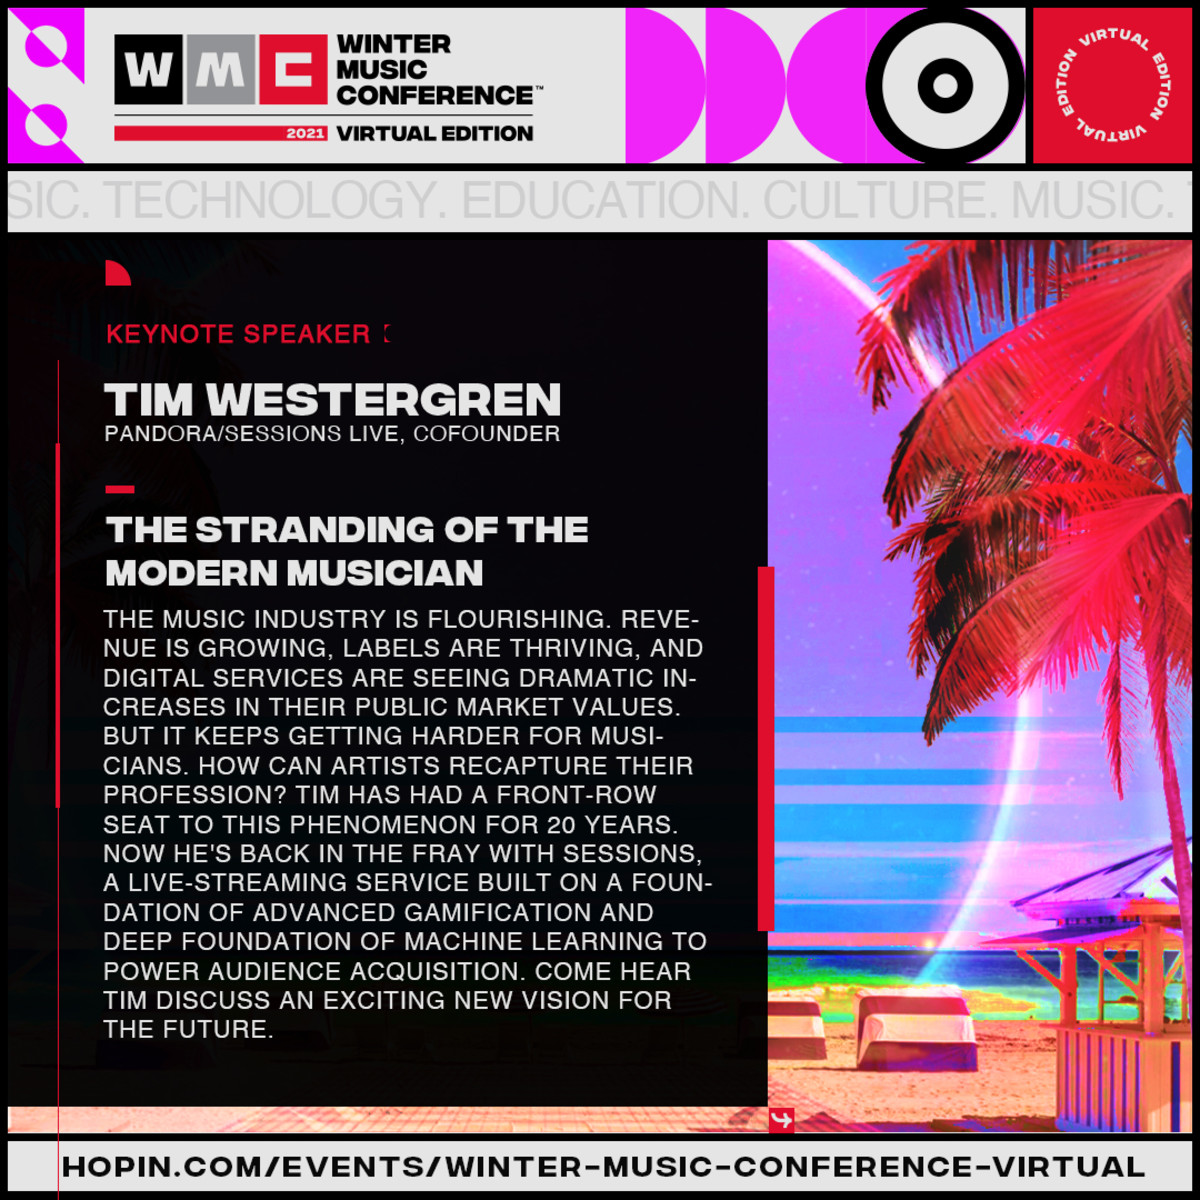 Keynote Description - Tim Westergren